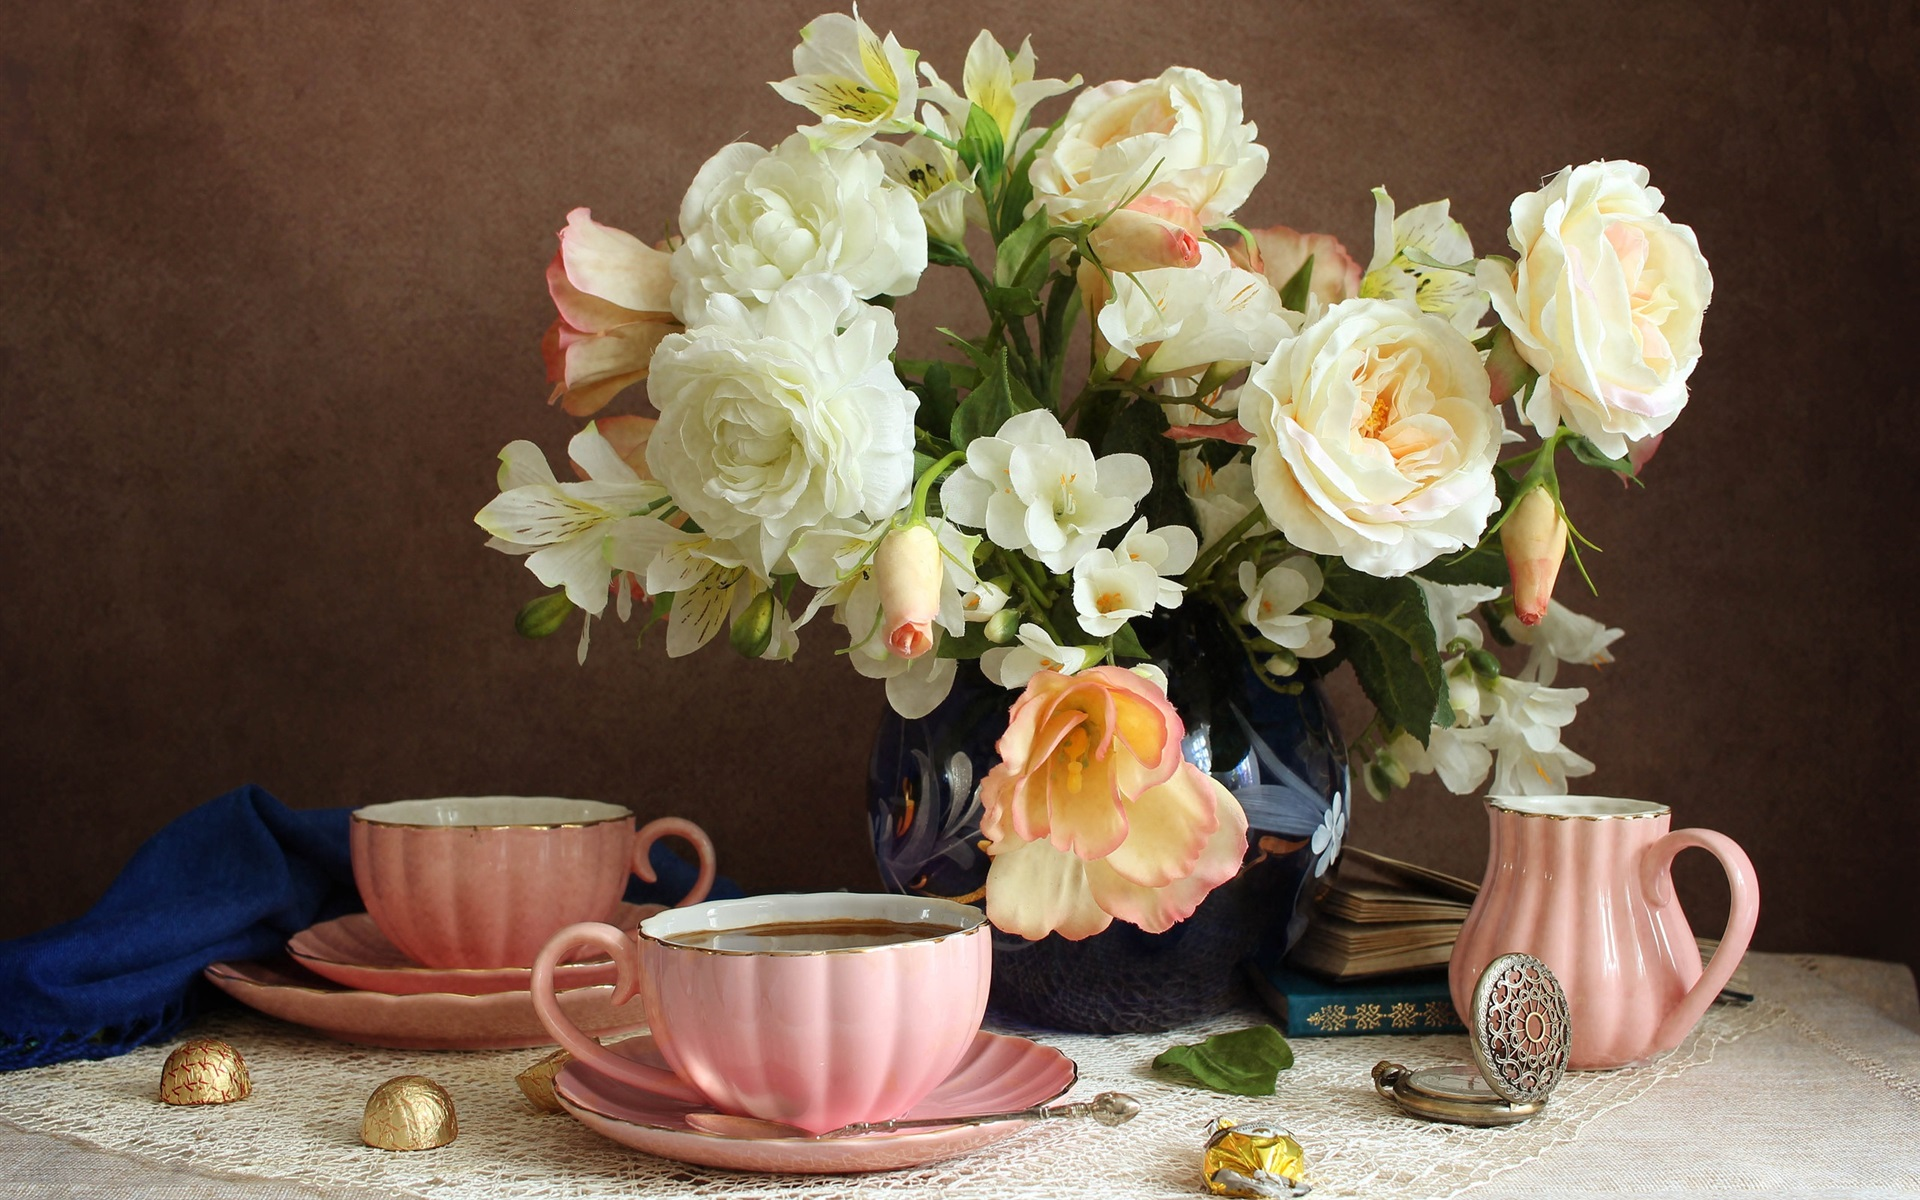 Flowers-still-life-coffee_1920x1200.jpg